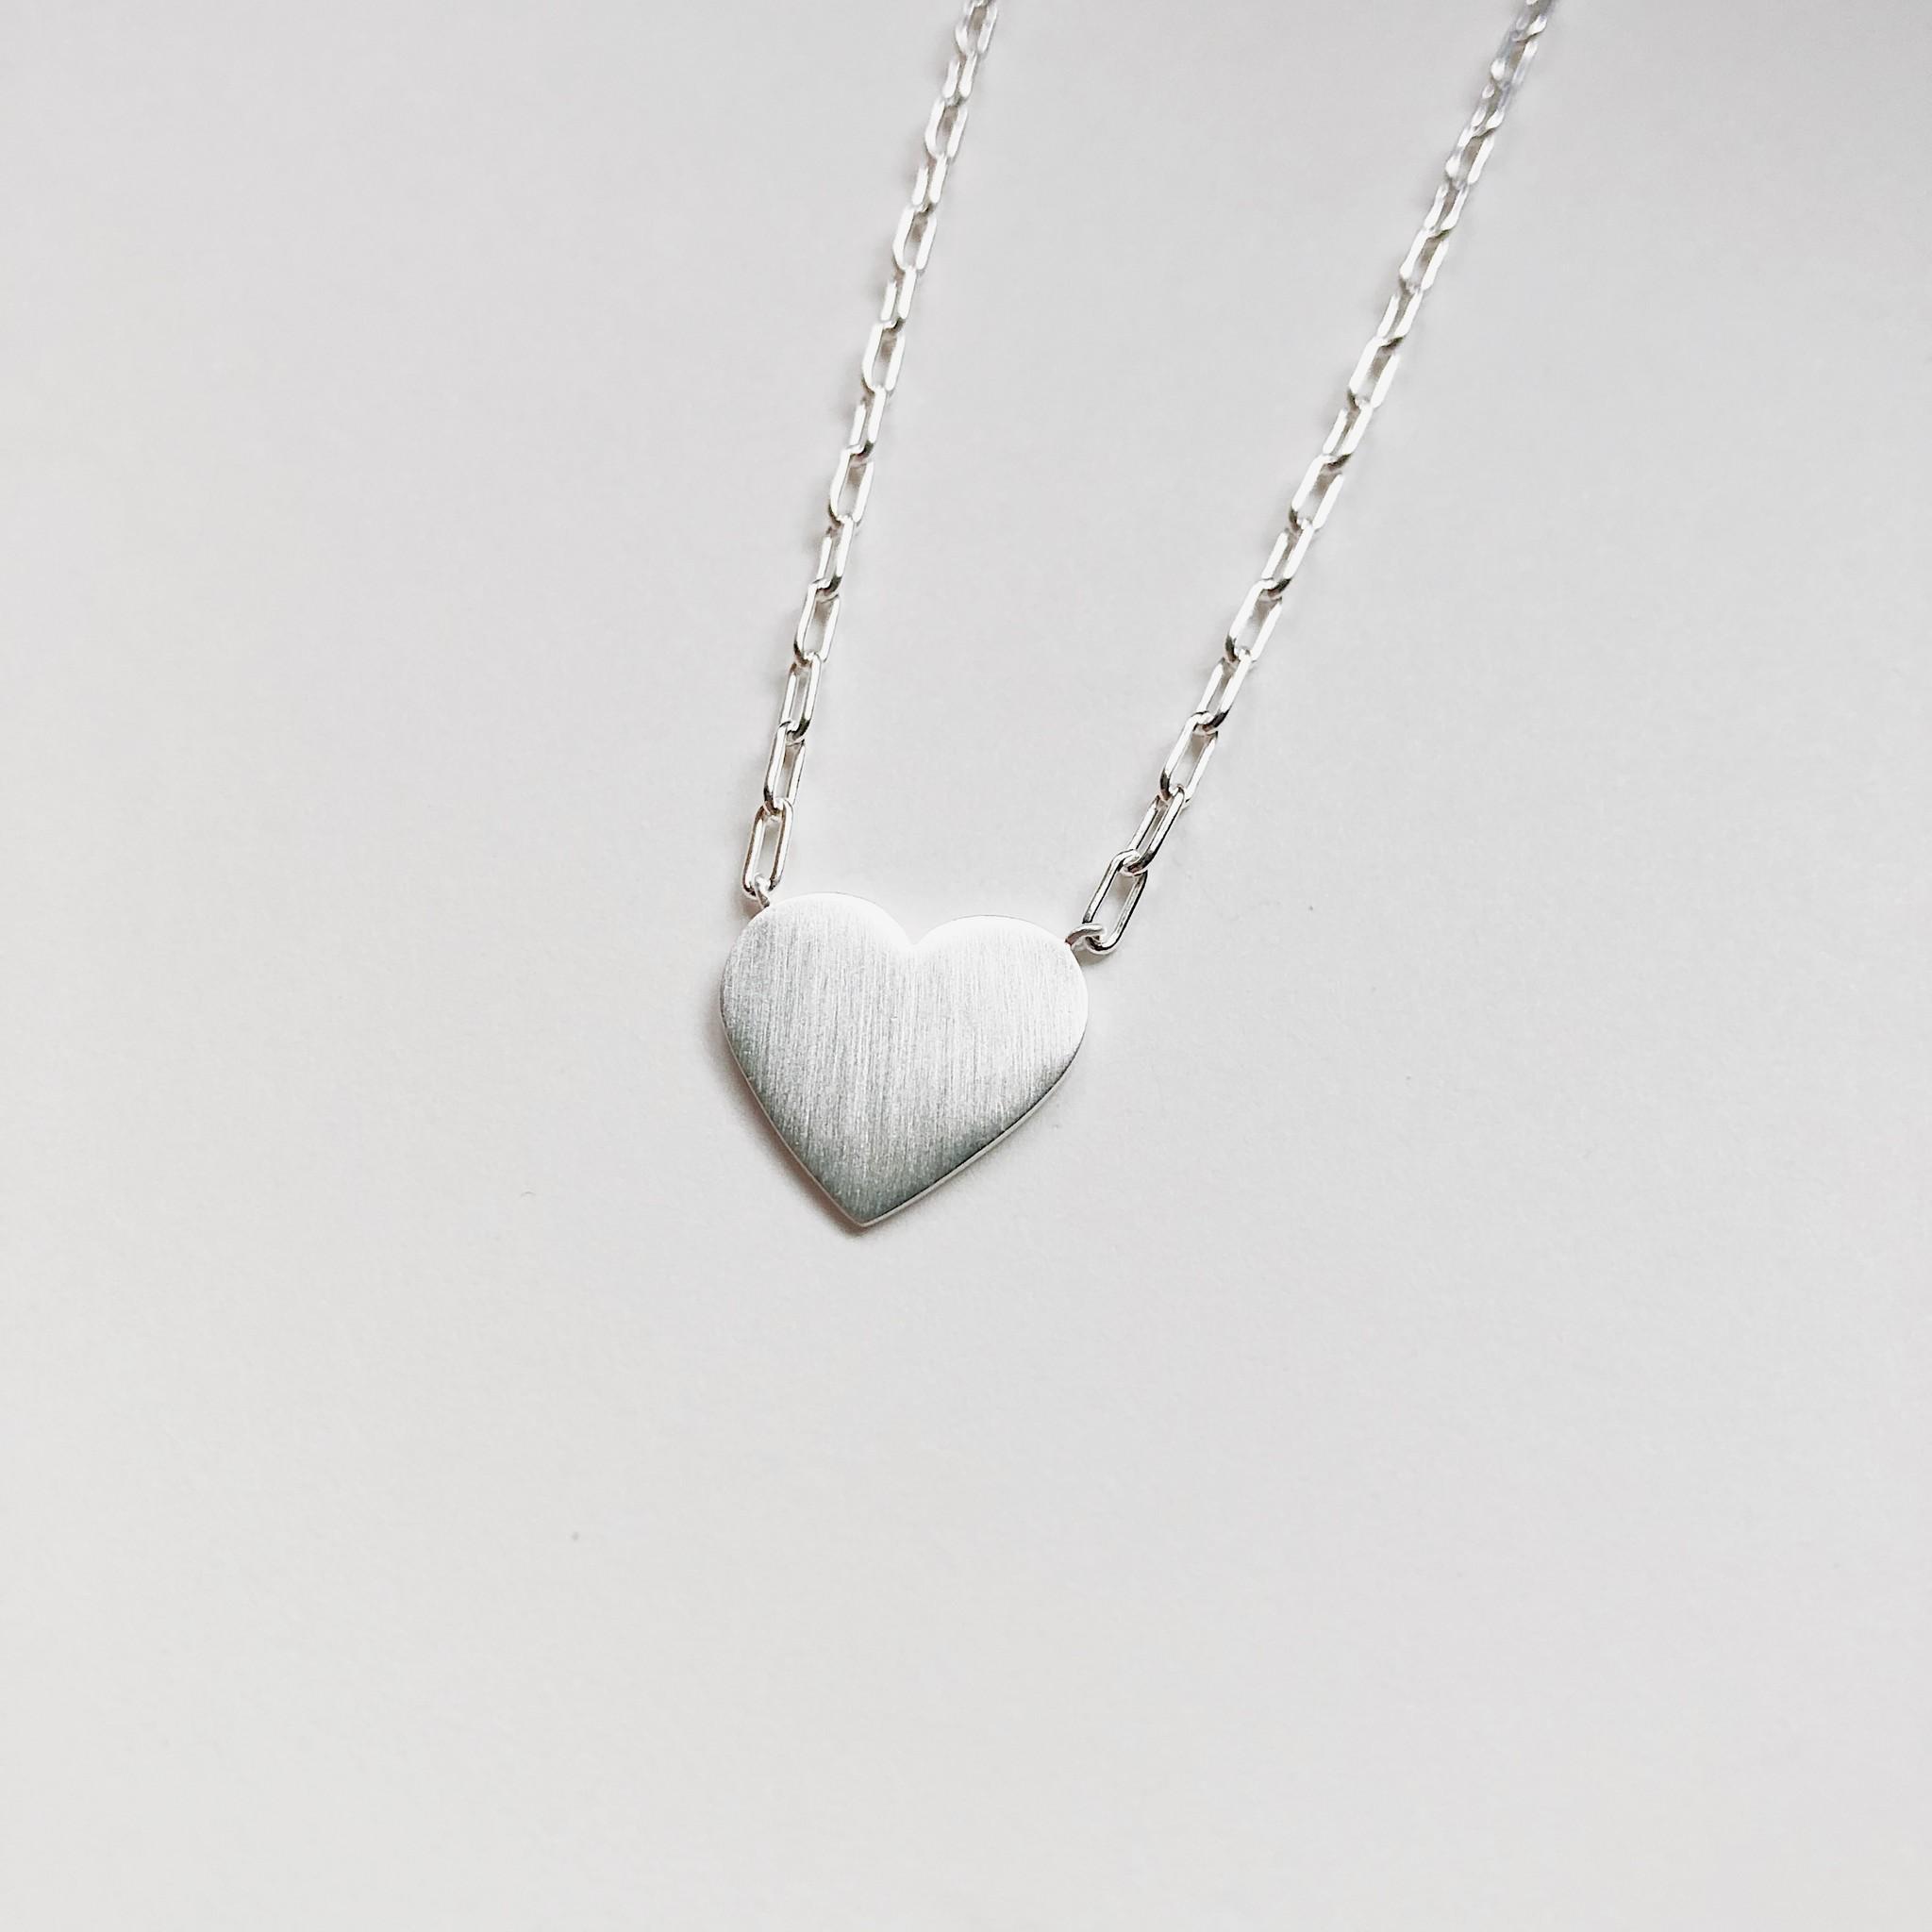 Tashi Silver Brushed Heart Necklace